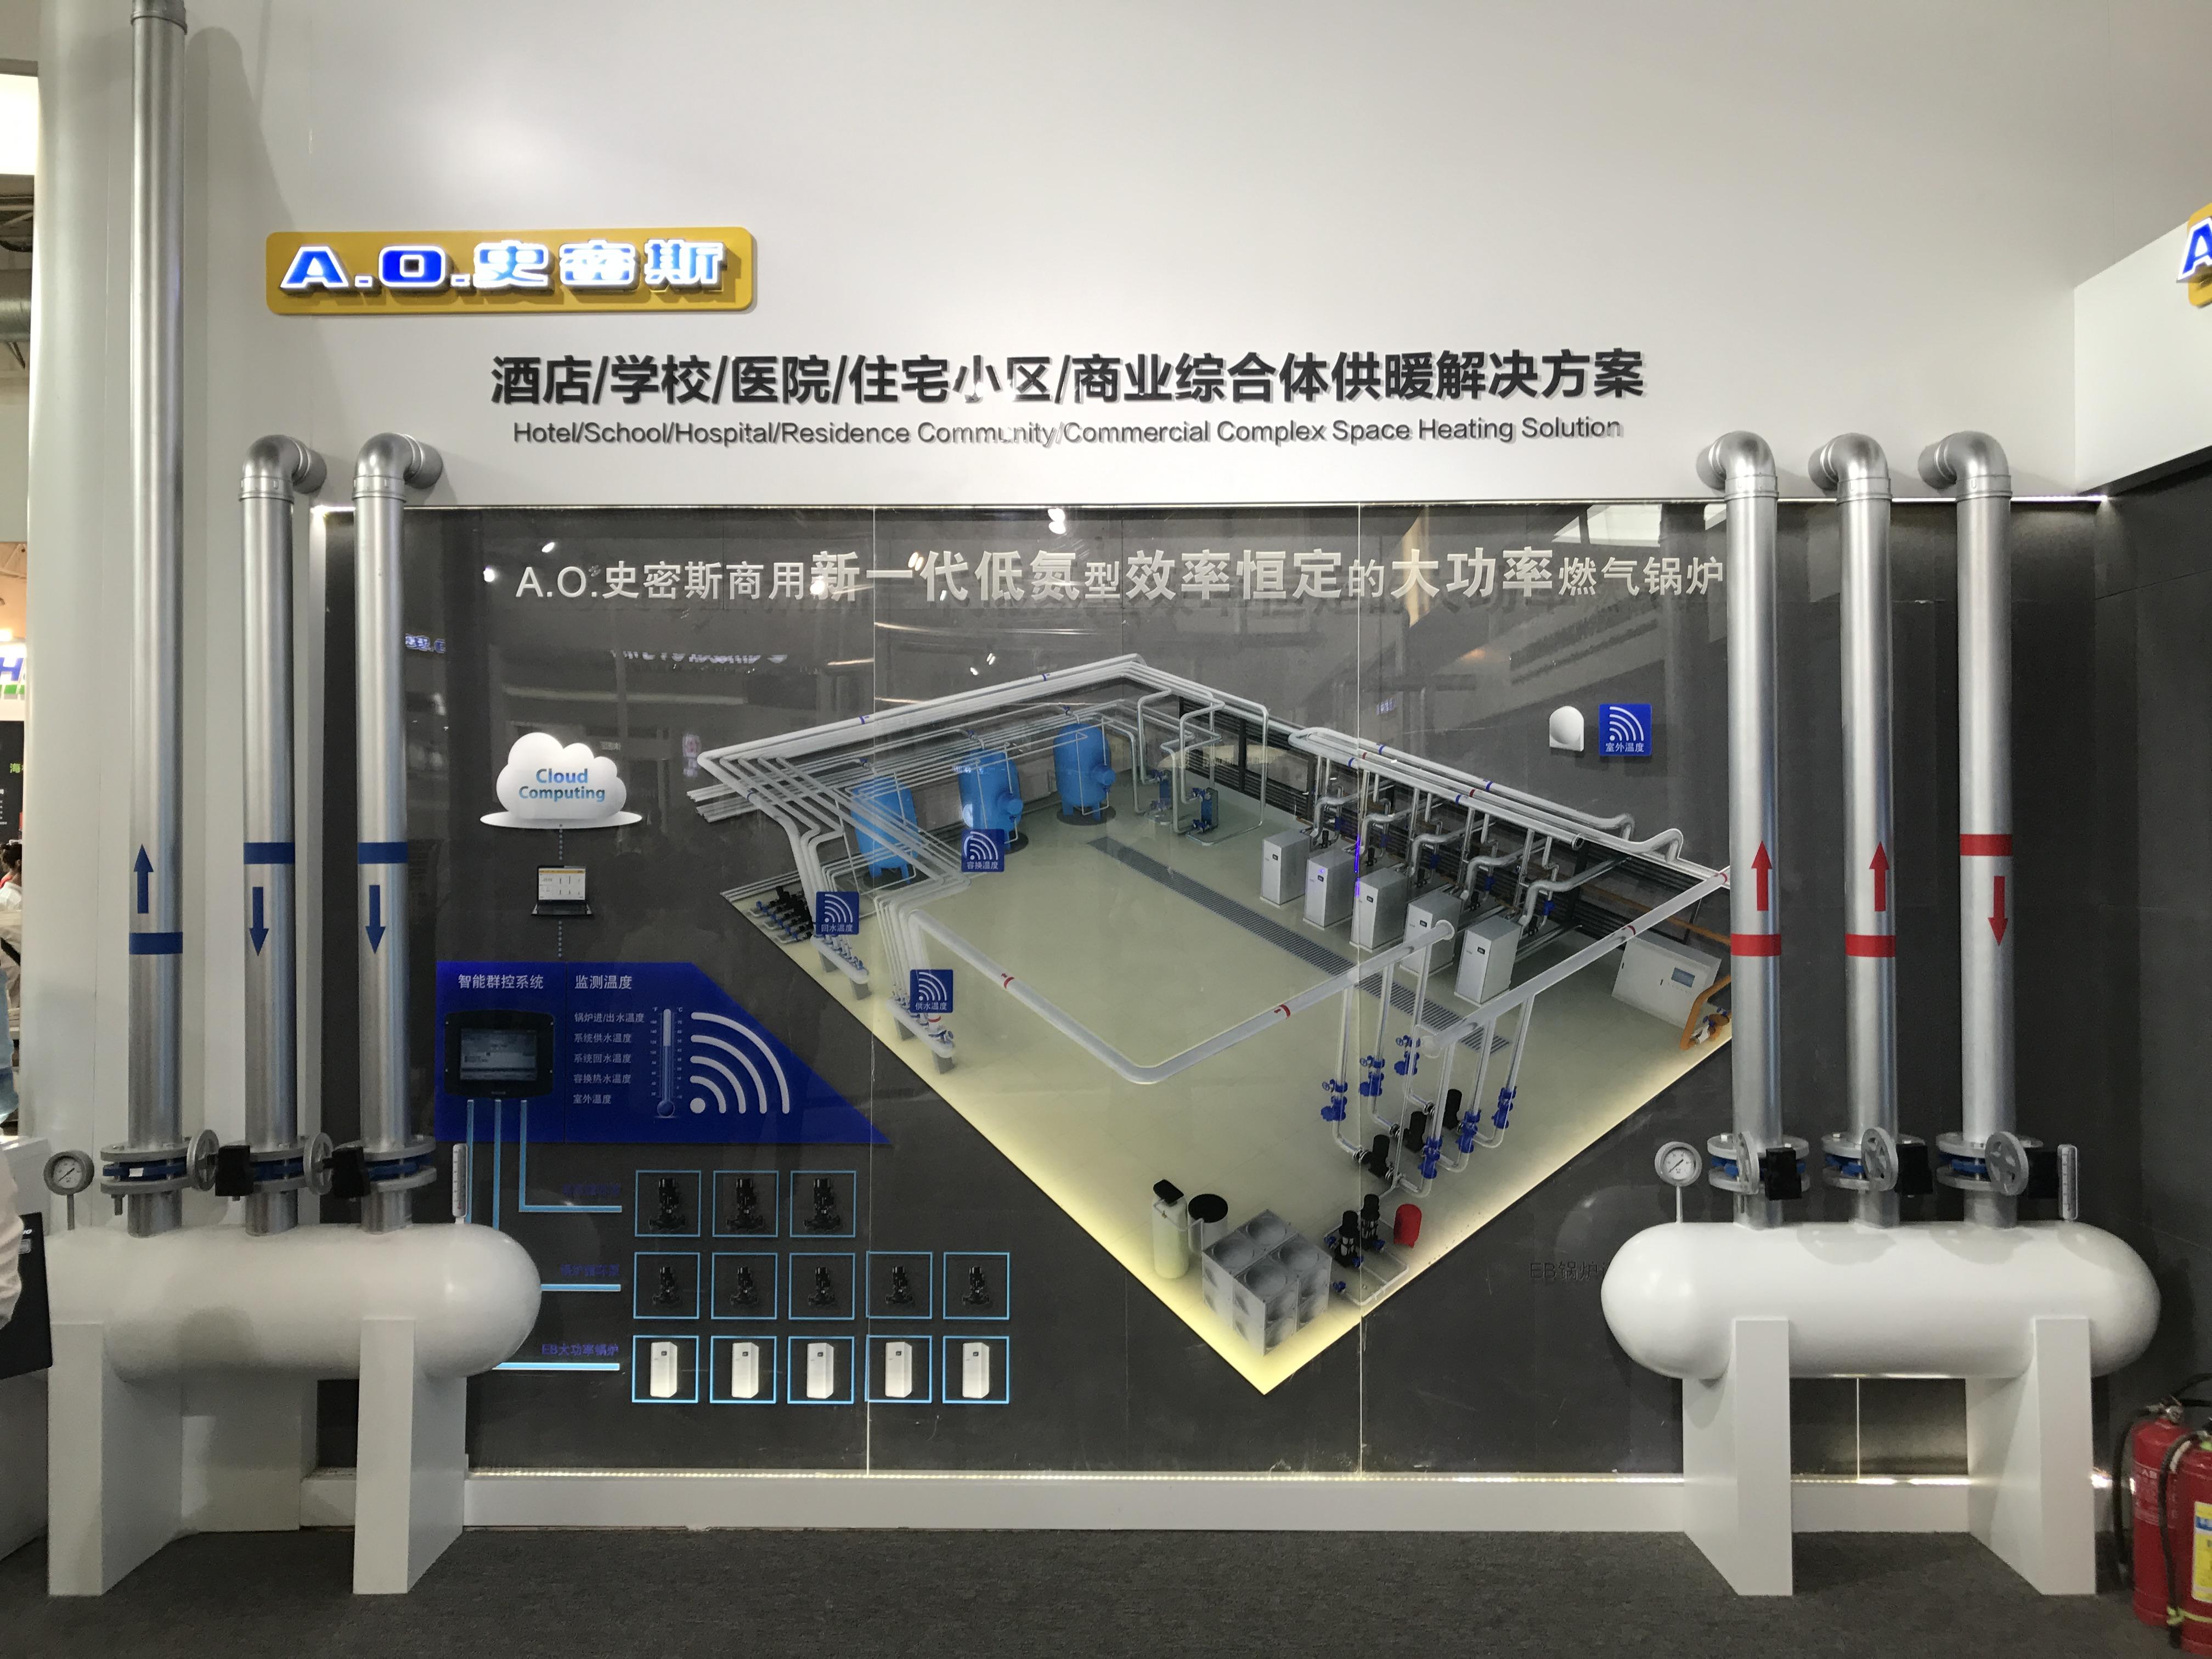 A.O.史密斯ISH展新一代低氮锅炉引清洁采暖新潮流